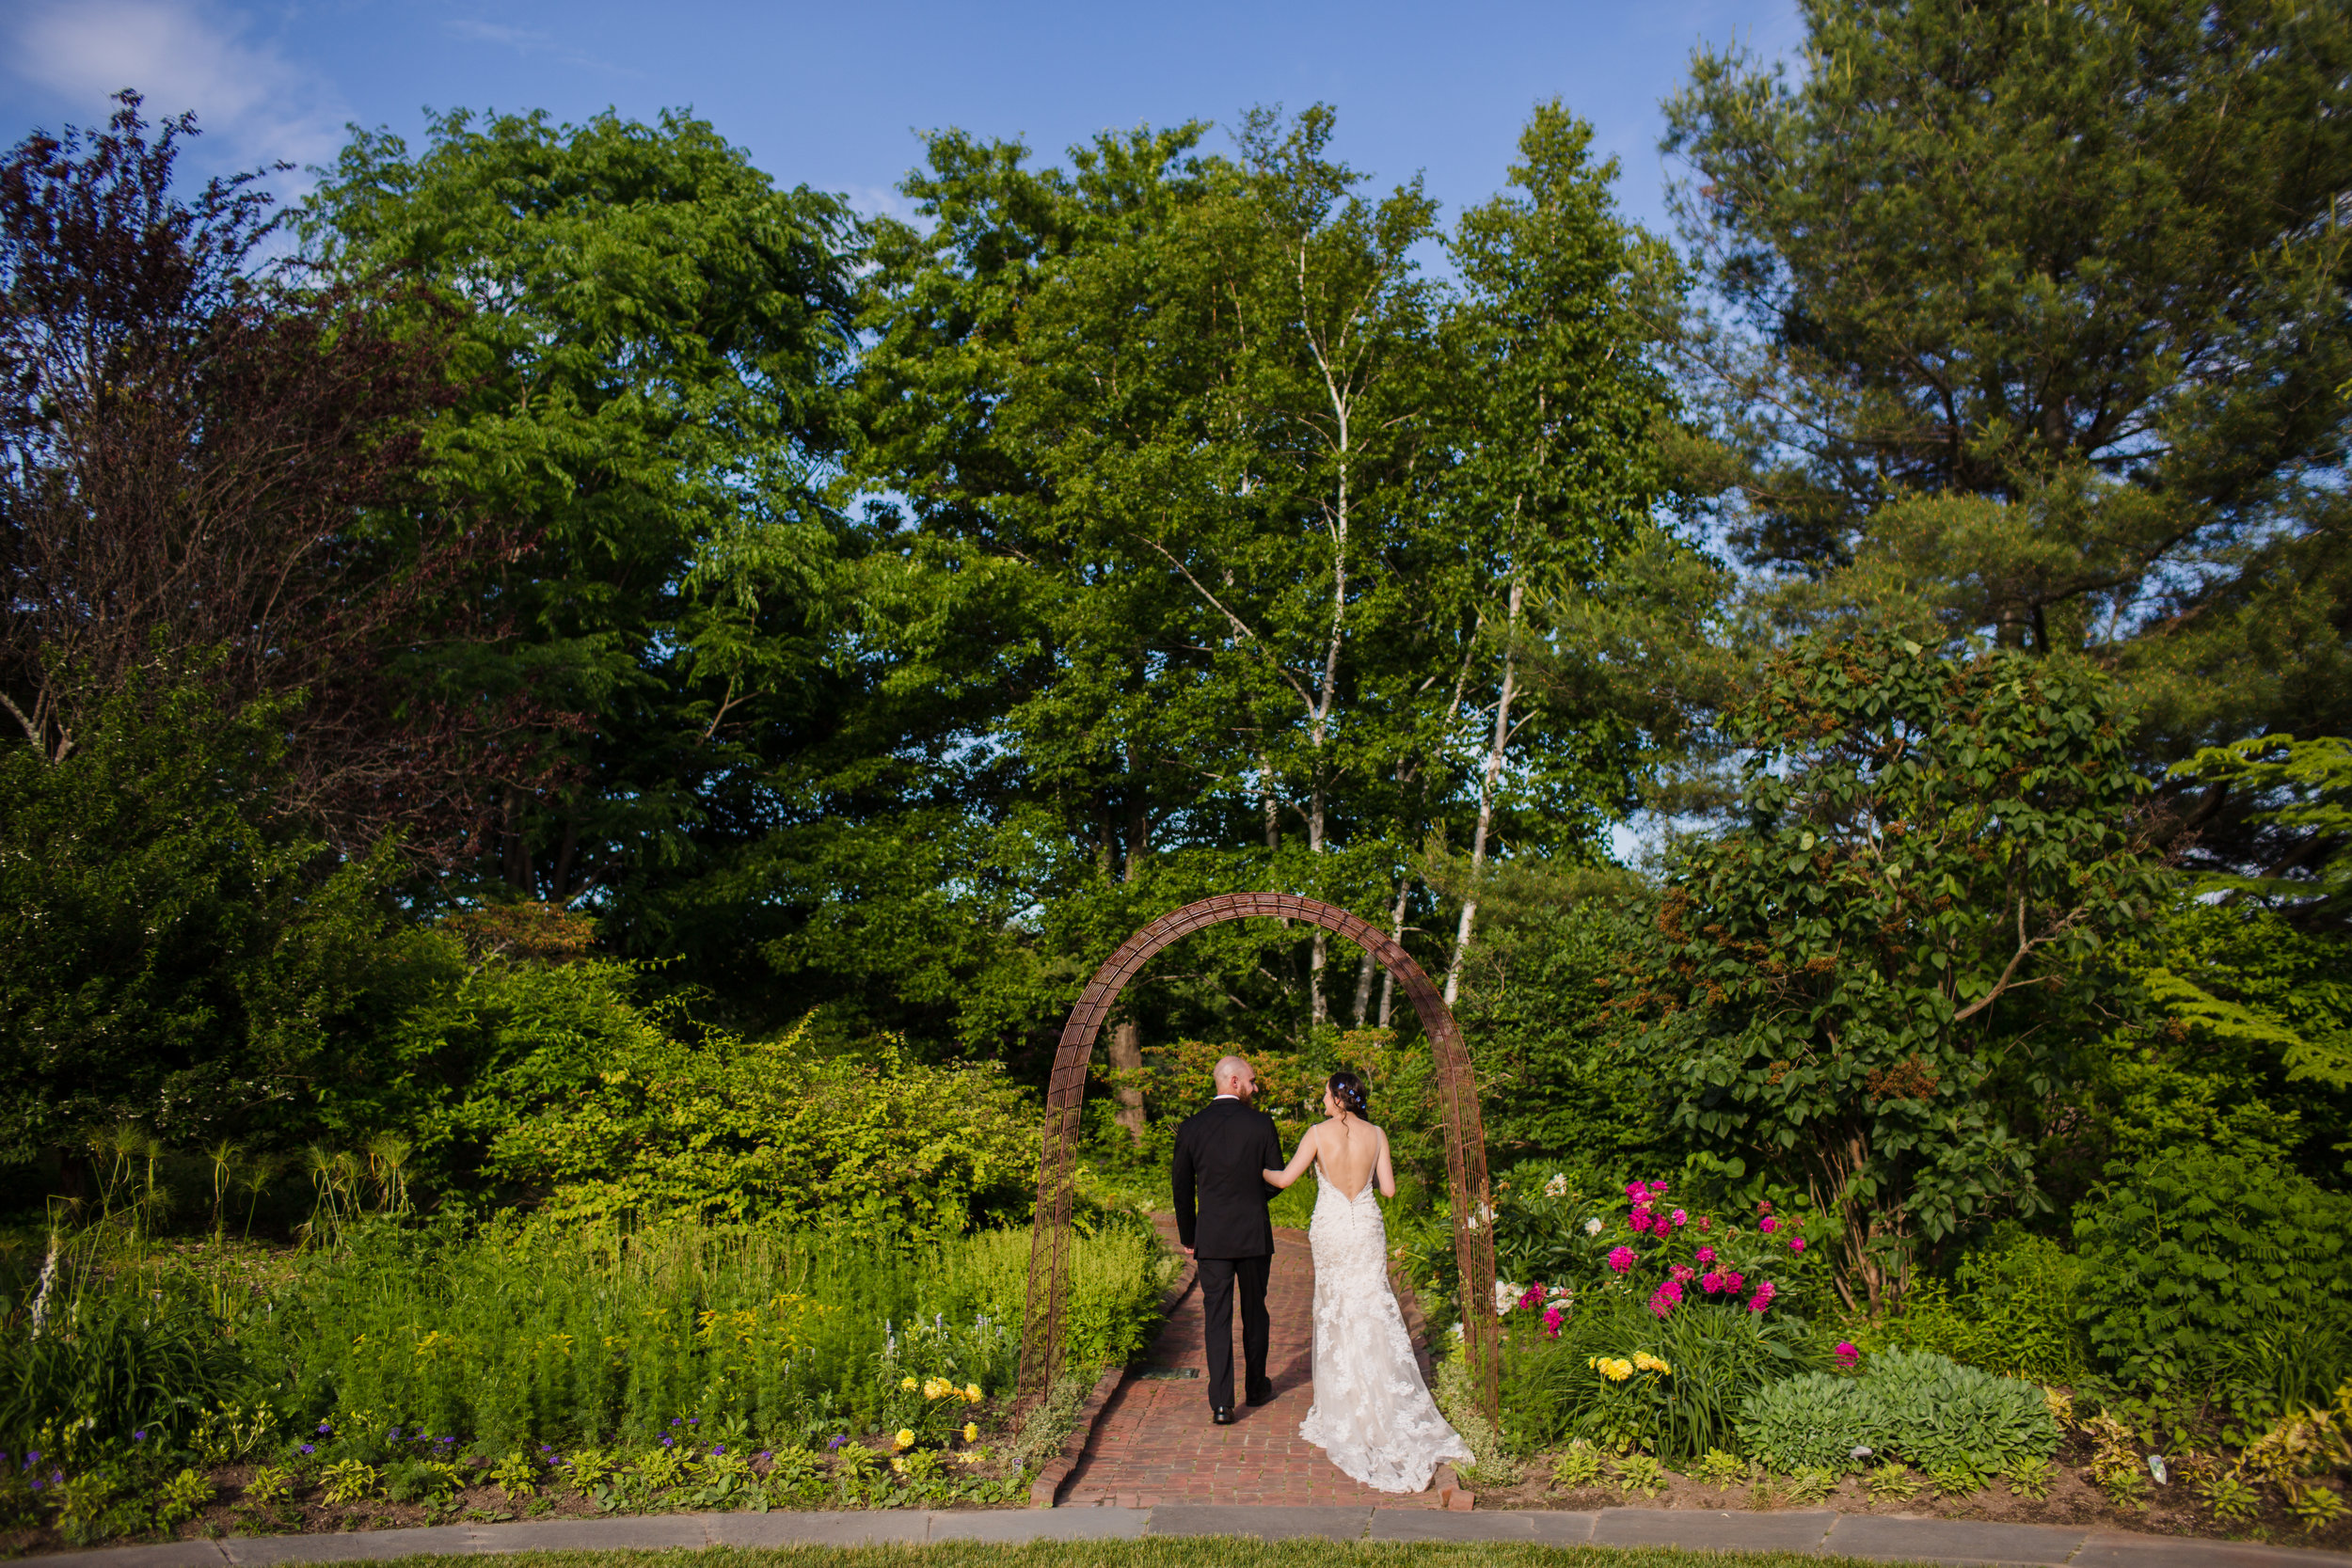 Tower-Hill-Botanic-Garden-Wedding-021.JPG